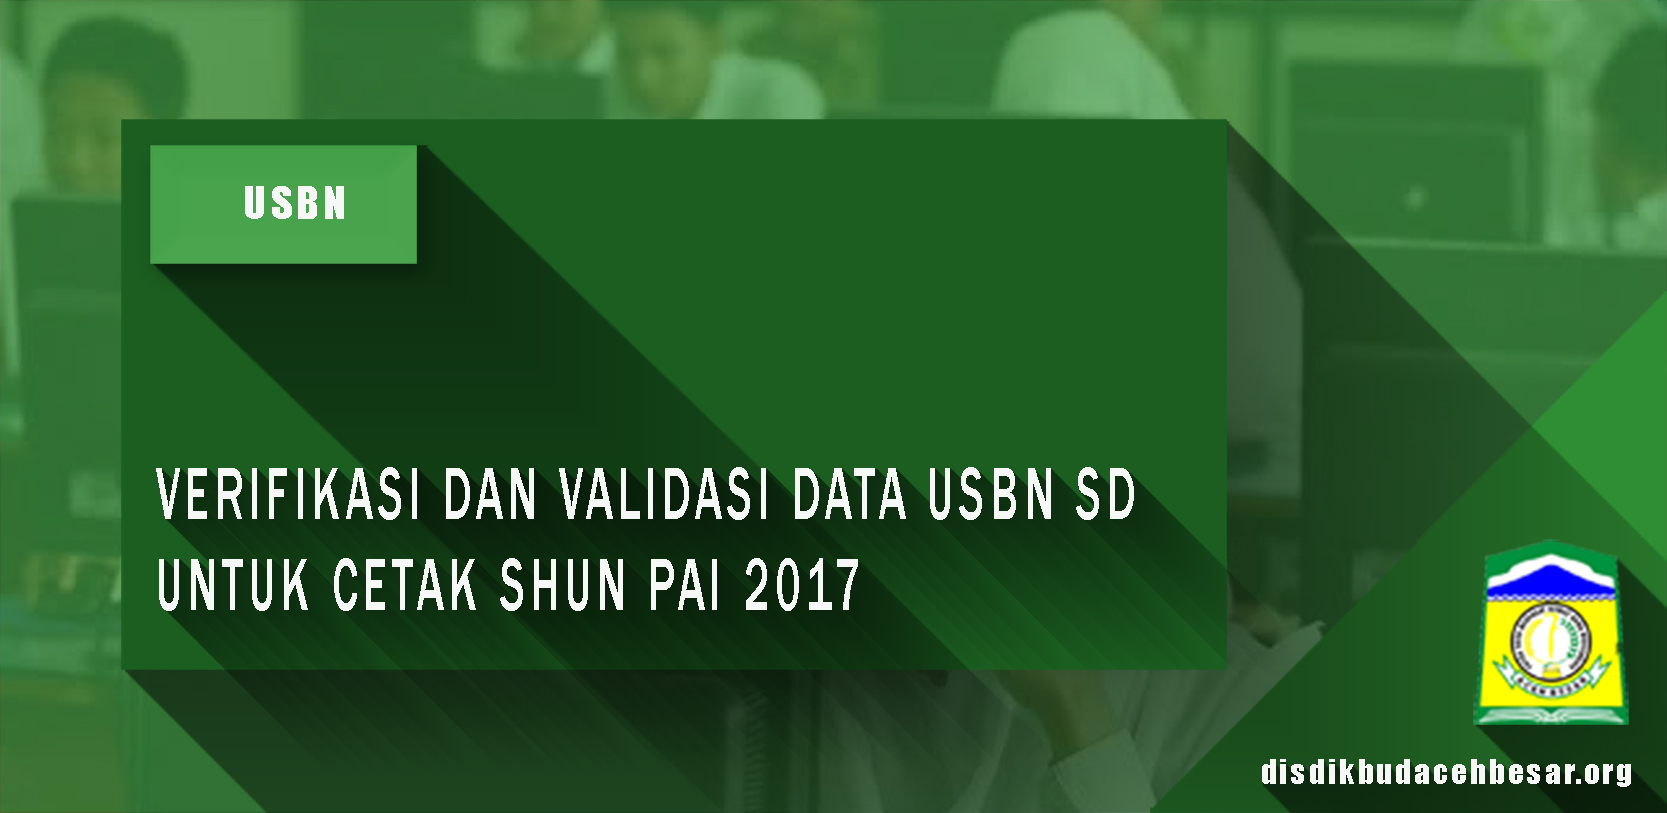 VERIFIKASI DAN VALIDASI DATA USBN SD UNTUK CETAK SHUN PAI 2017